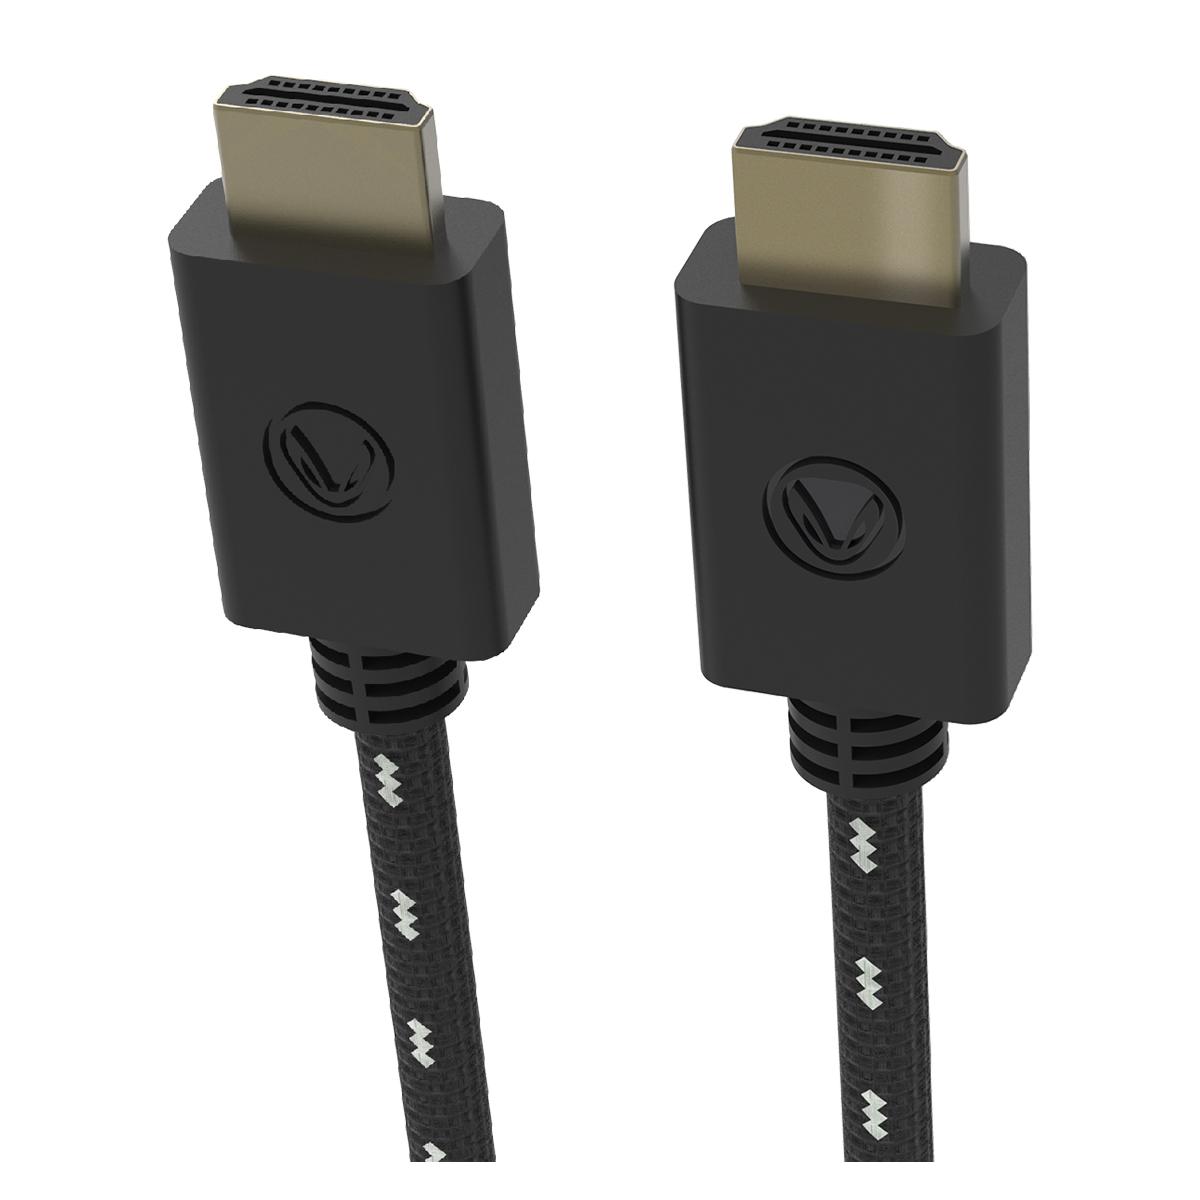 SnakeByte SONY PS5 HDMIケーブル HDMI:CABLE 5™ 4K (3M)多くの機器で使えるHDMIケーブル